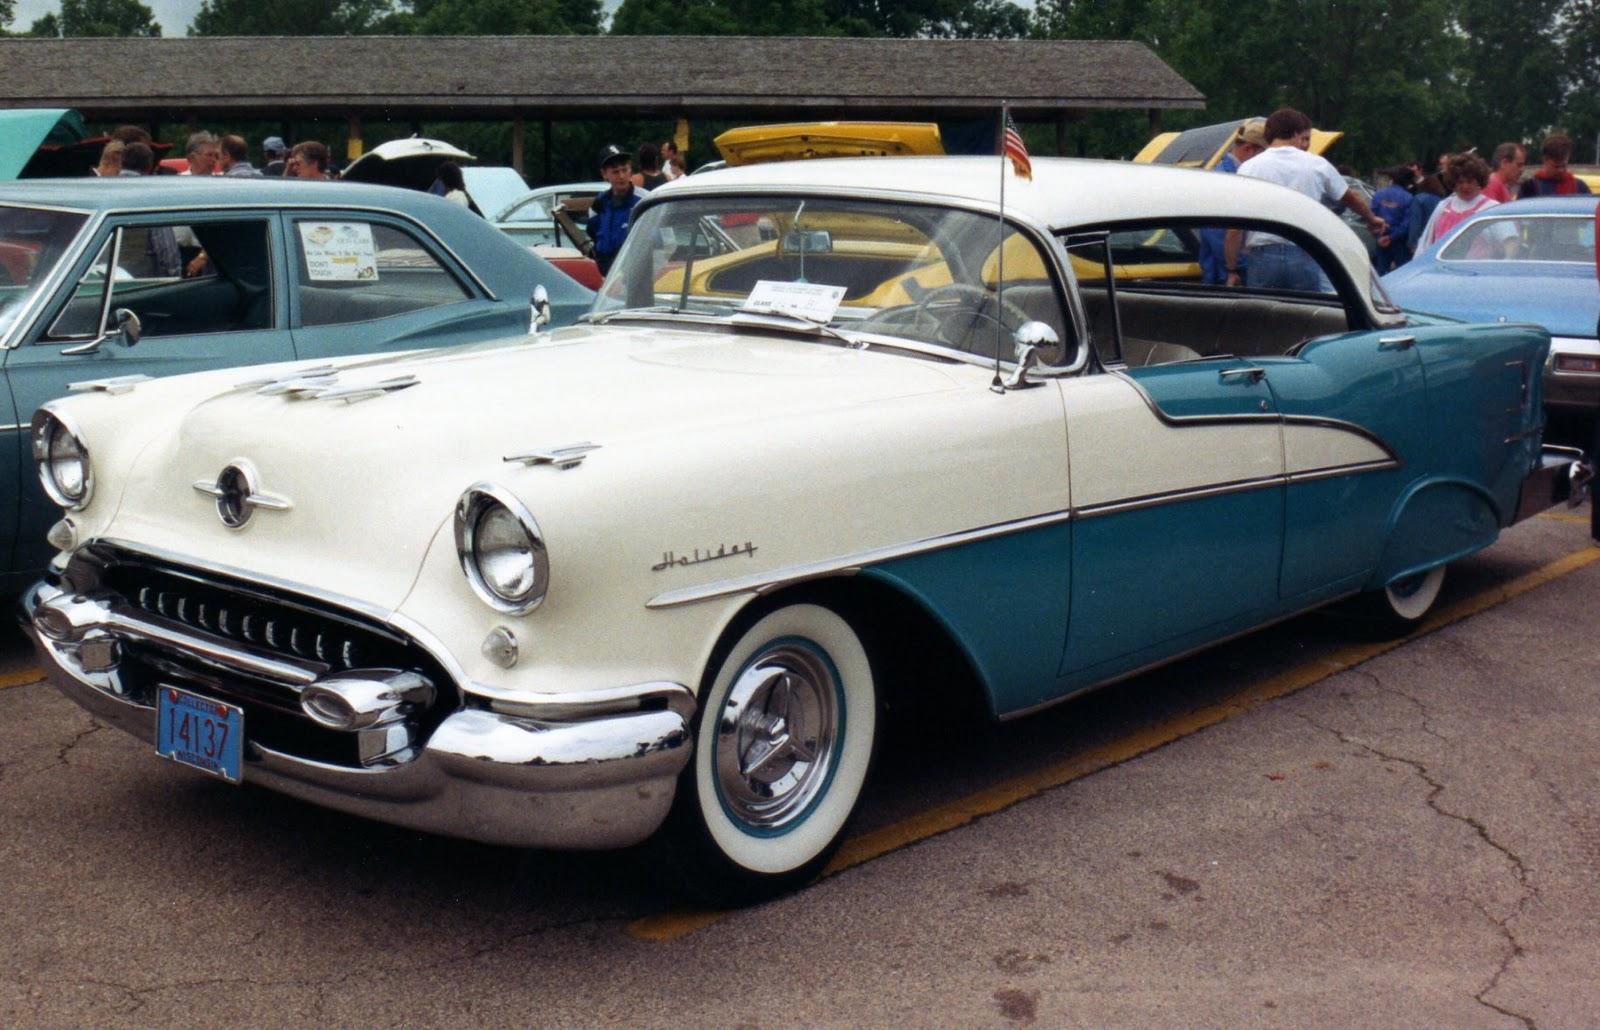 LUTON: CLASSIC AMERICAN CARS